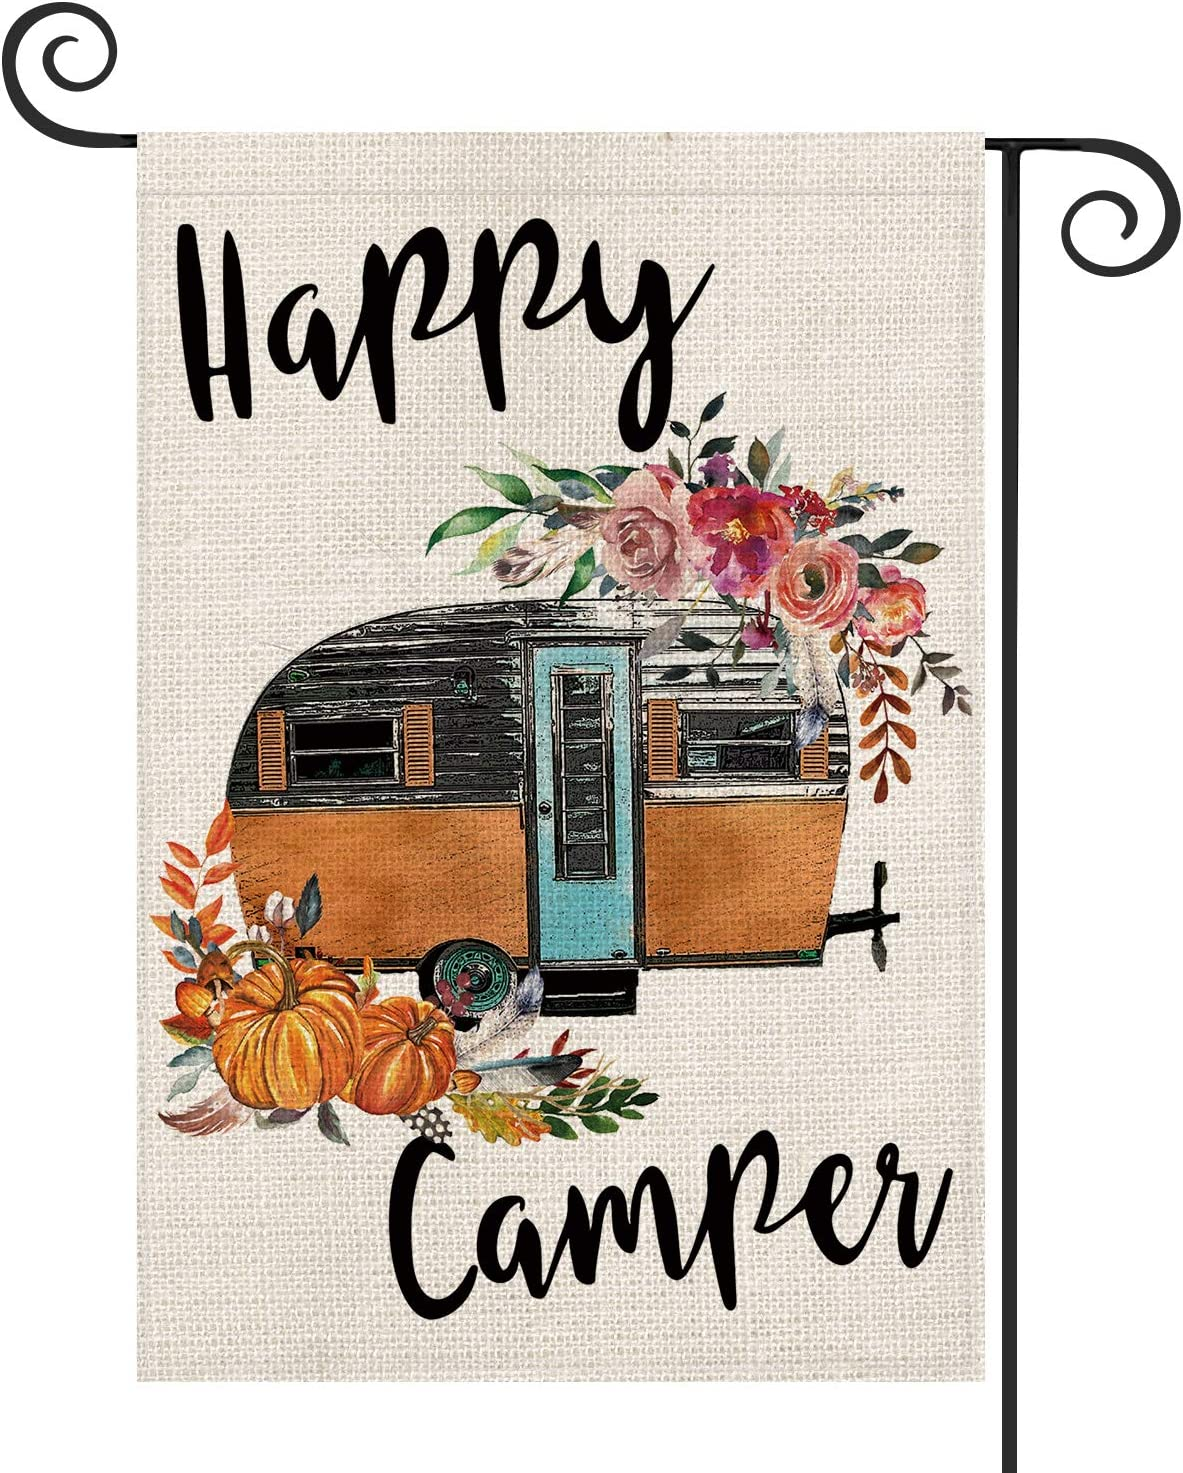 AVOIN Happy Camper Trailer Garden Flag Vertical Double Sized, Fall Autumn Pumpkin Flower Yard Outdoor Decoration 12.5 x 18 Inch